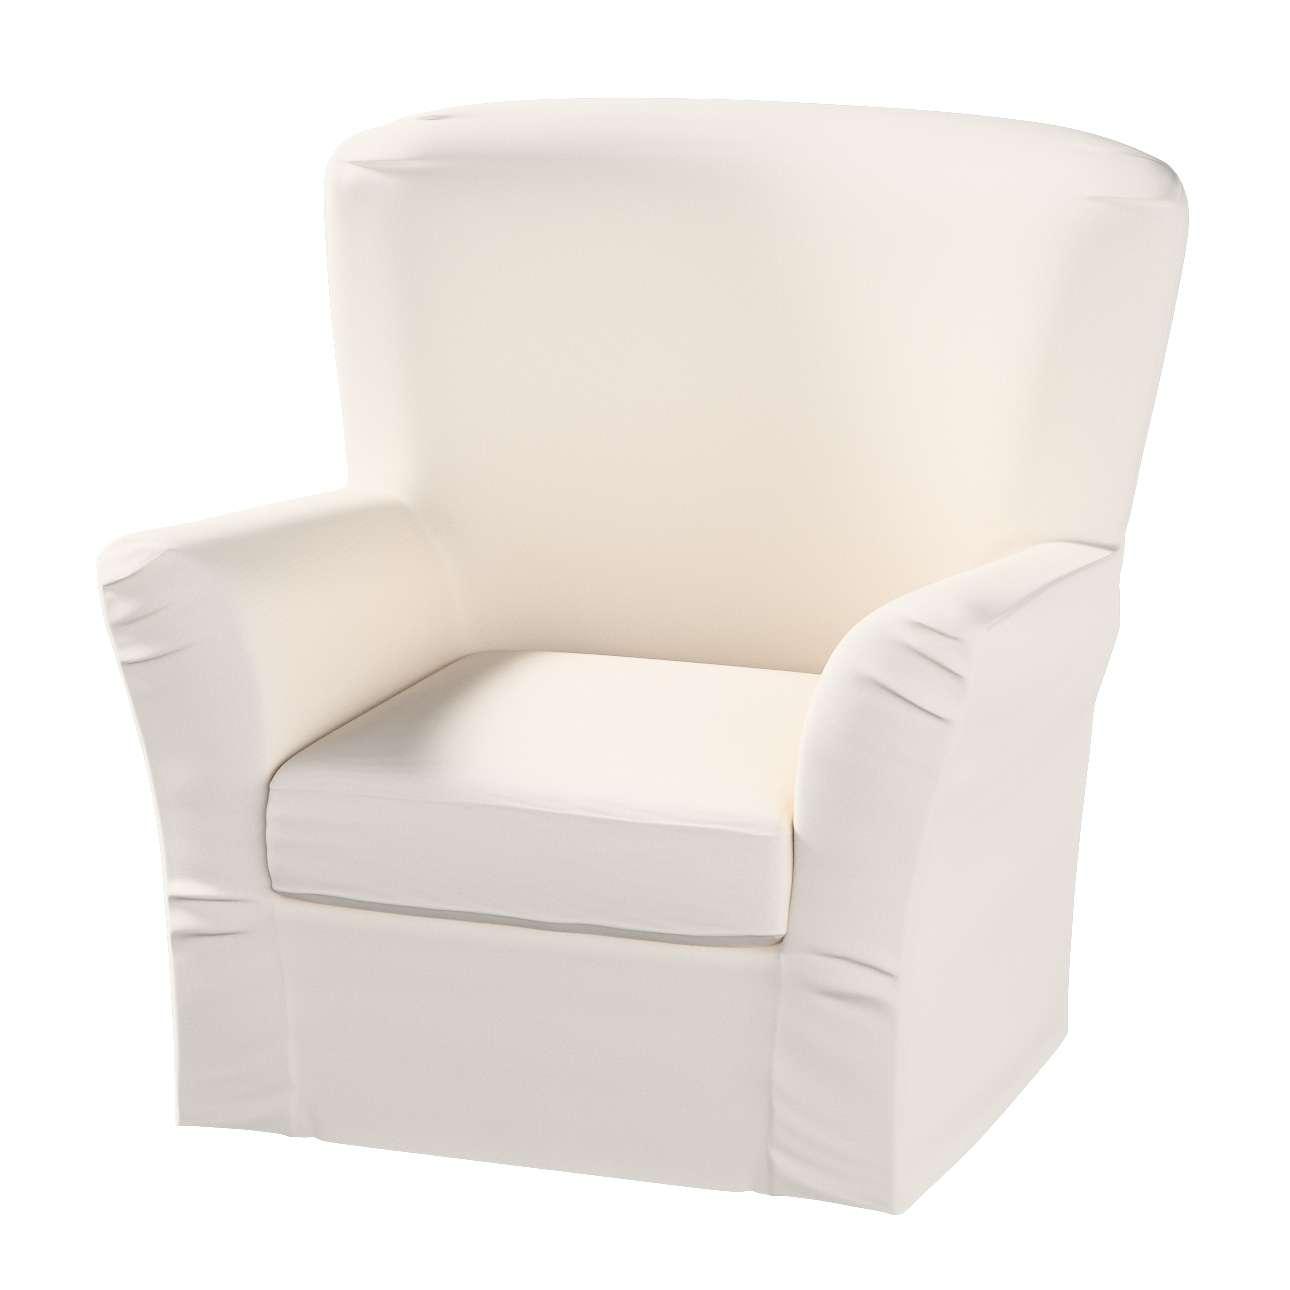 TOMELILLA fotelio užvalkalas TOMELILLA fotelis kolekcijoje Etna , audinys: 705-01